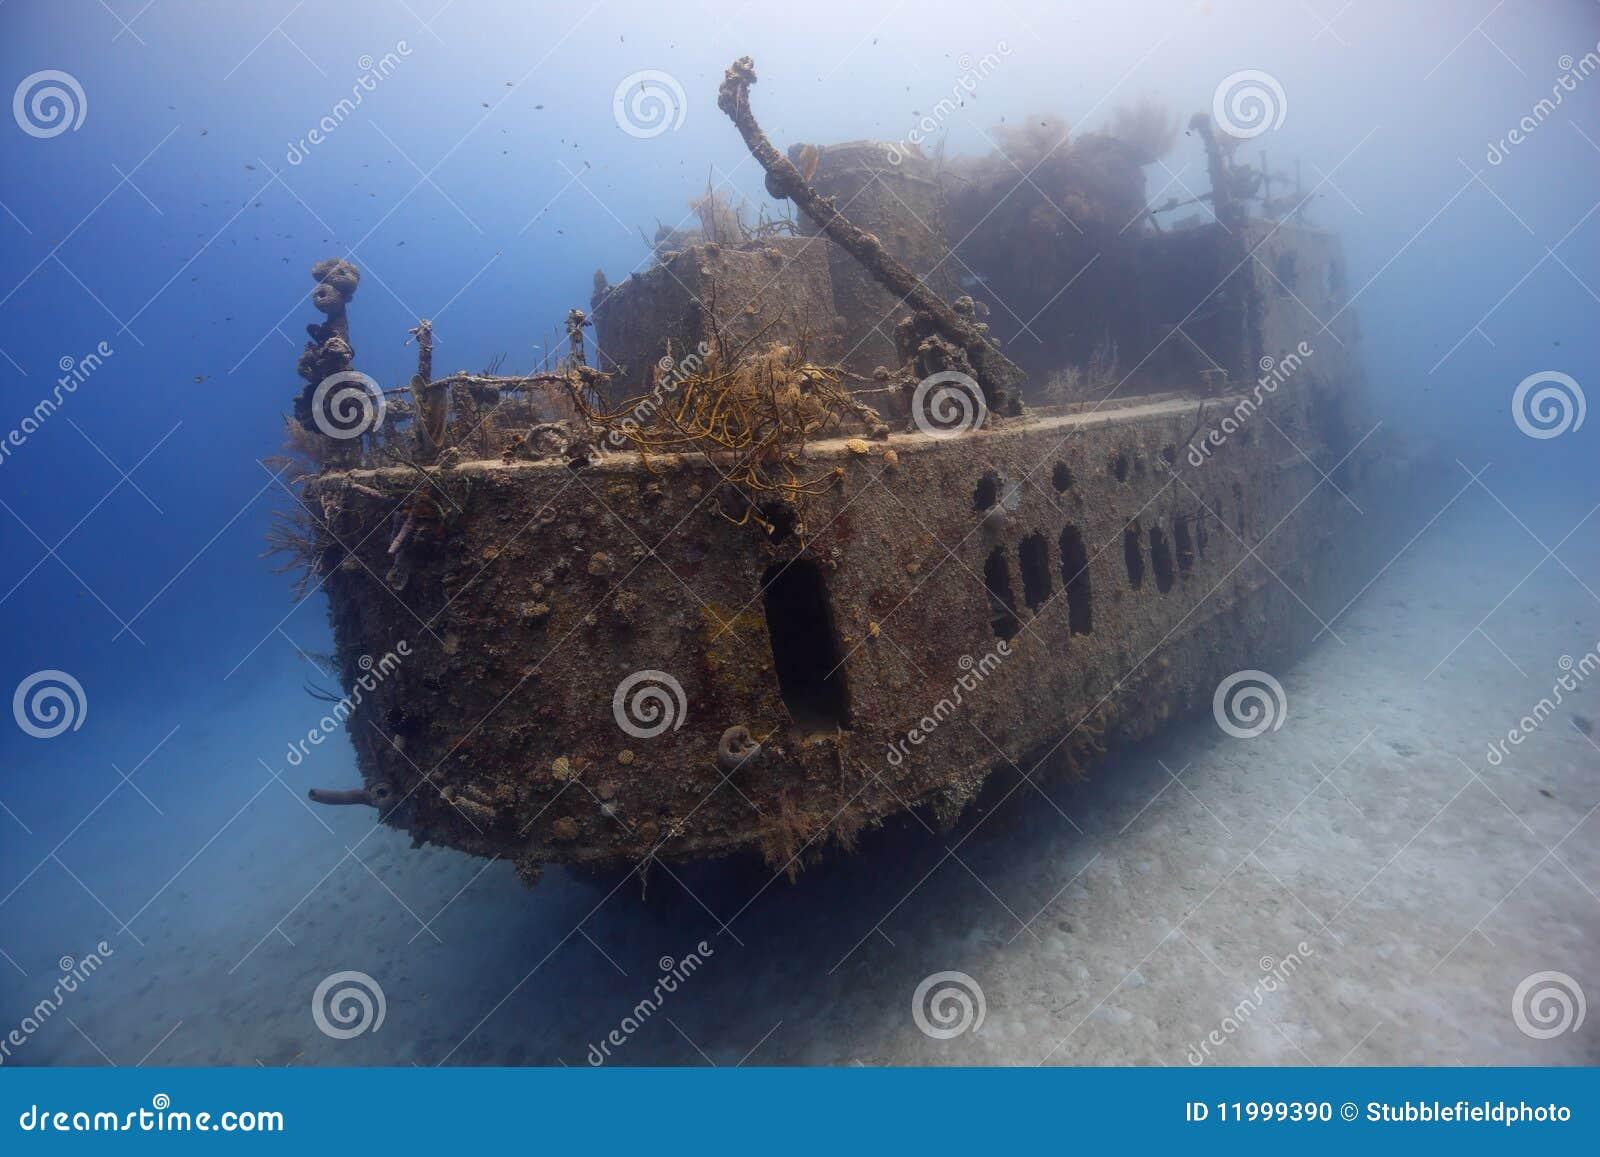 Prince Albert wreck